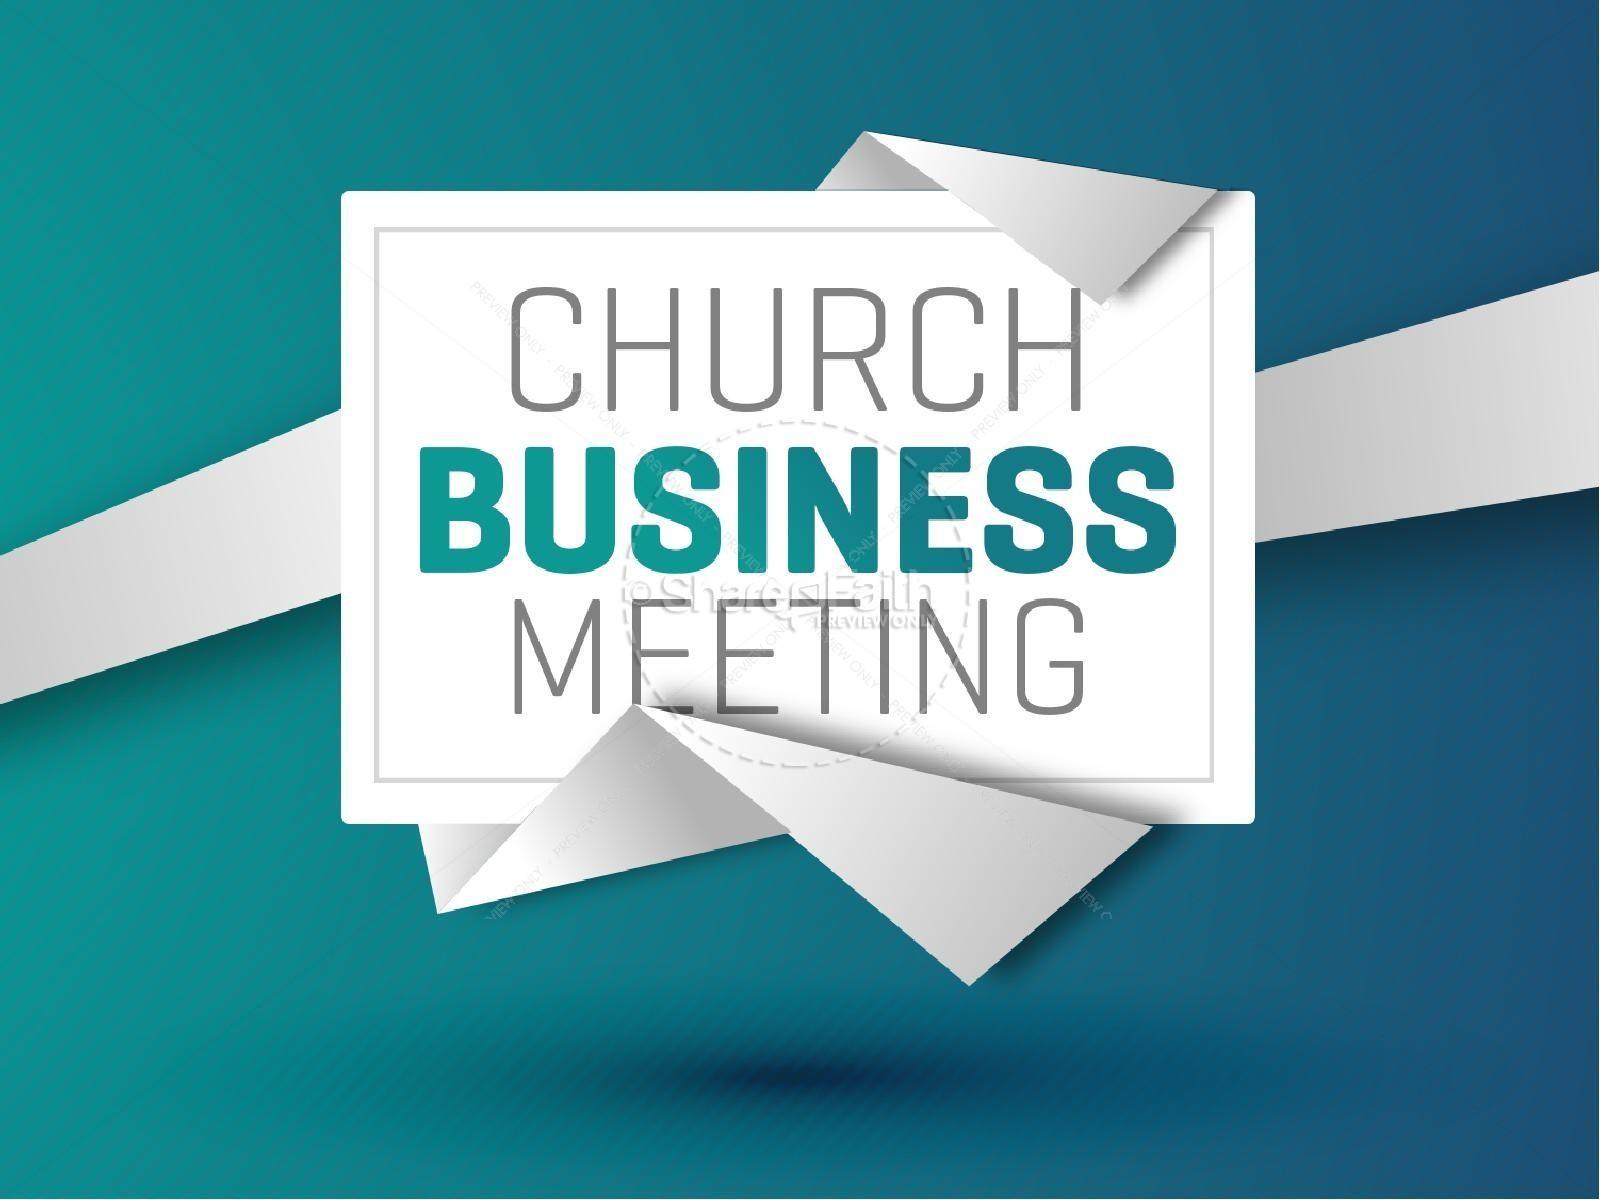 Church Business Meeting Christian Powerpoint.